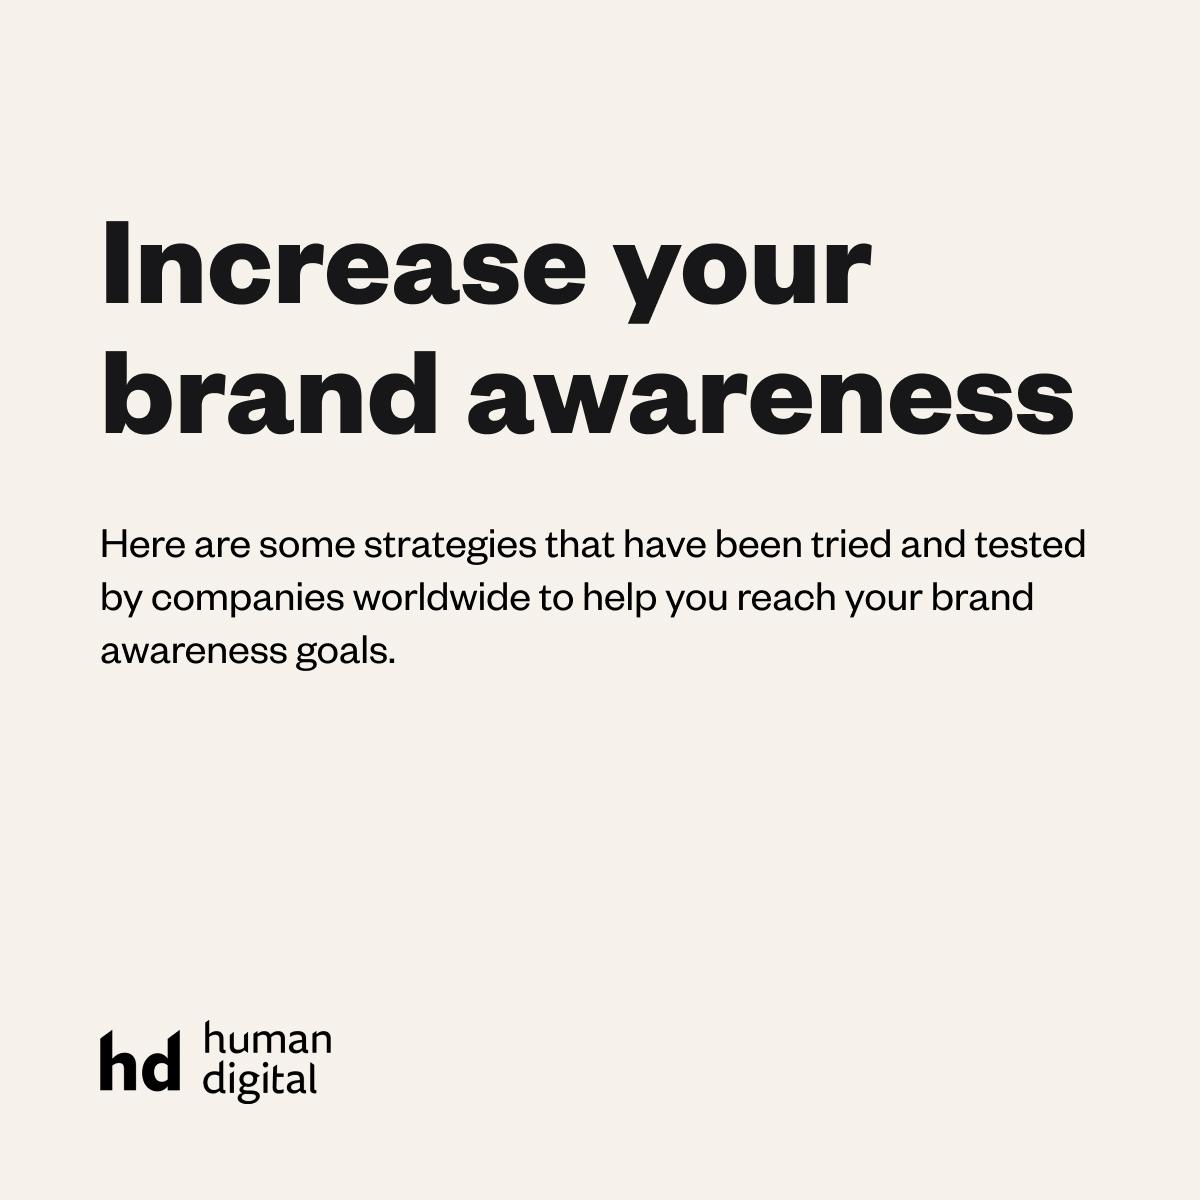 Increase your brand awareness